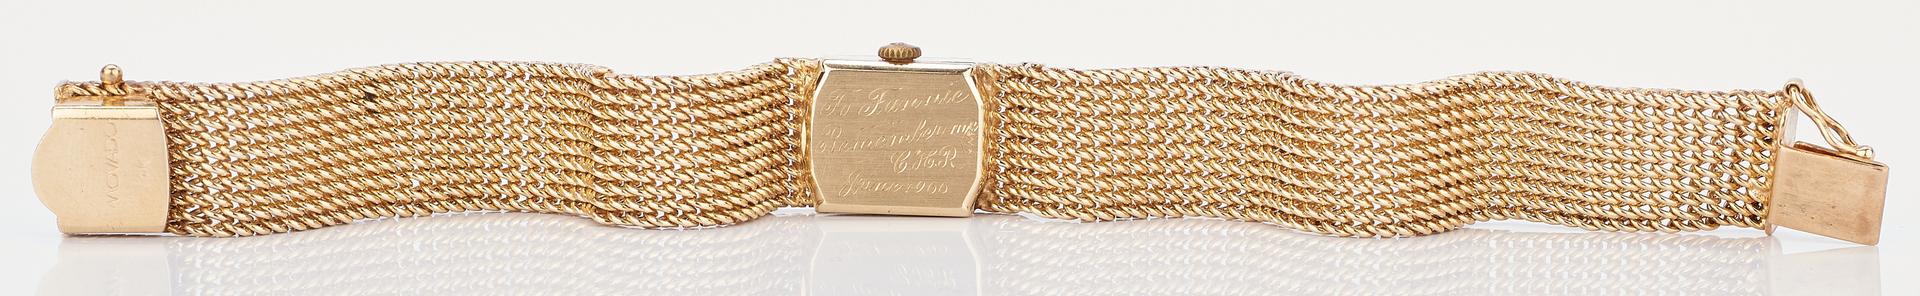 Lot 233: Ladies 14K Yellow Gold Movado Watch